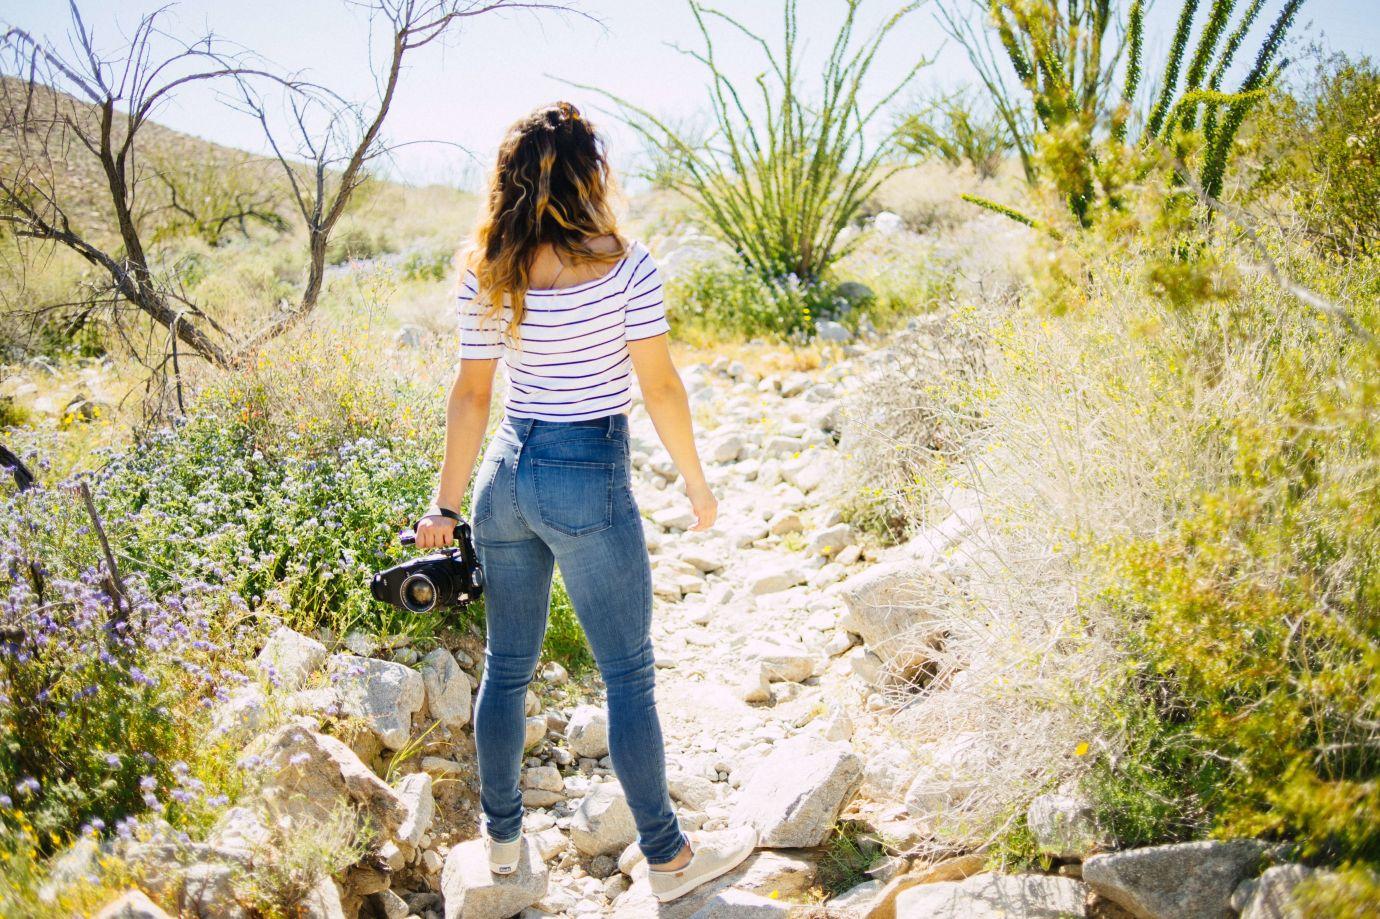 Frau mit enger Jeans in der Natur